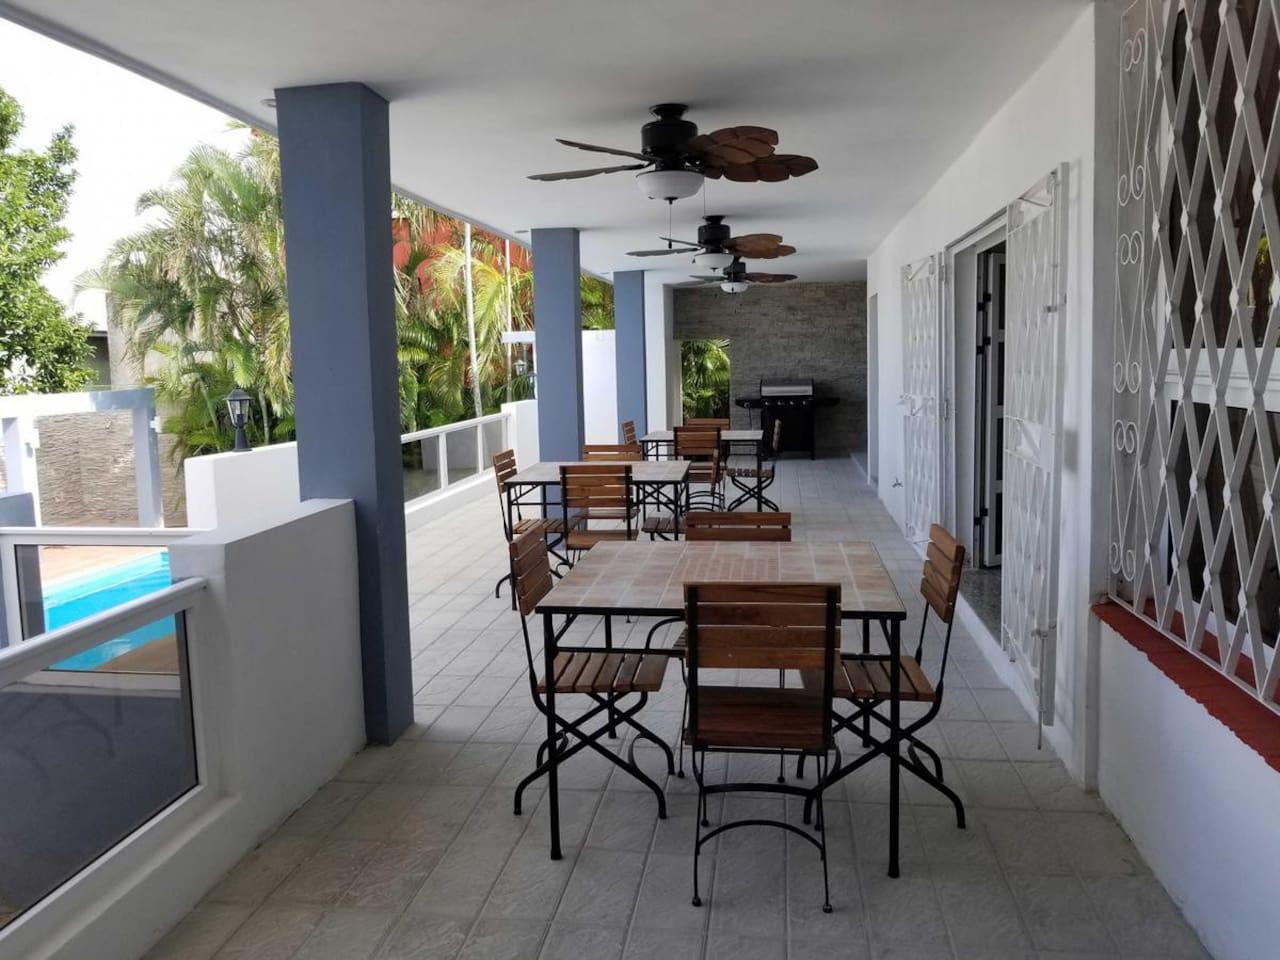 Villa Don Teto Suite & 8 Rooms: Great Havana View photo 15918342